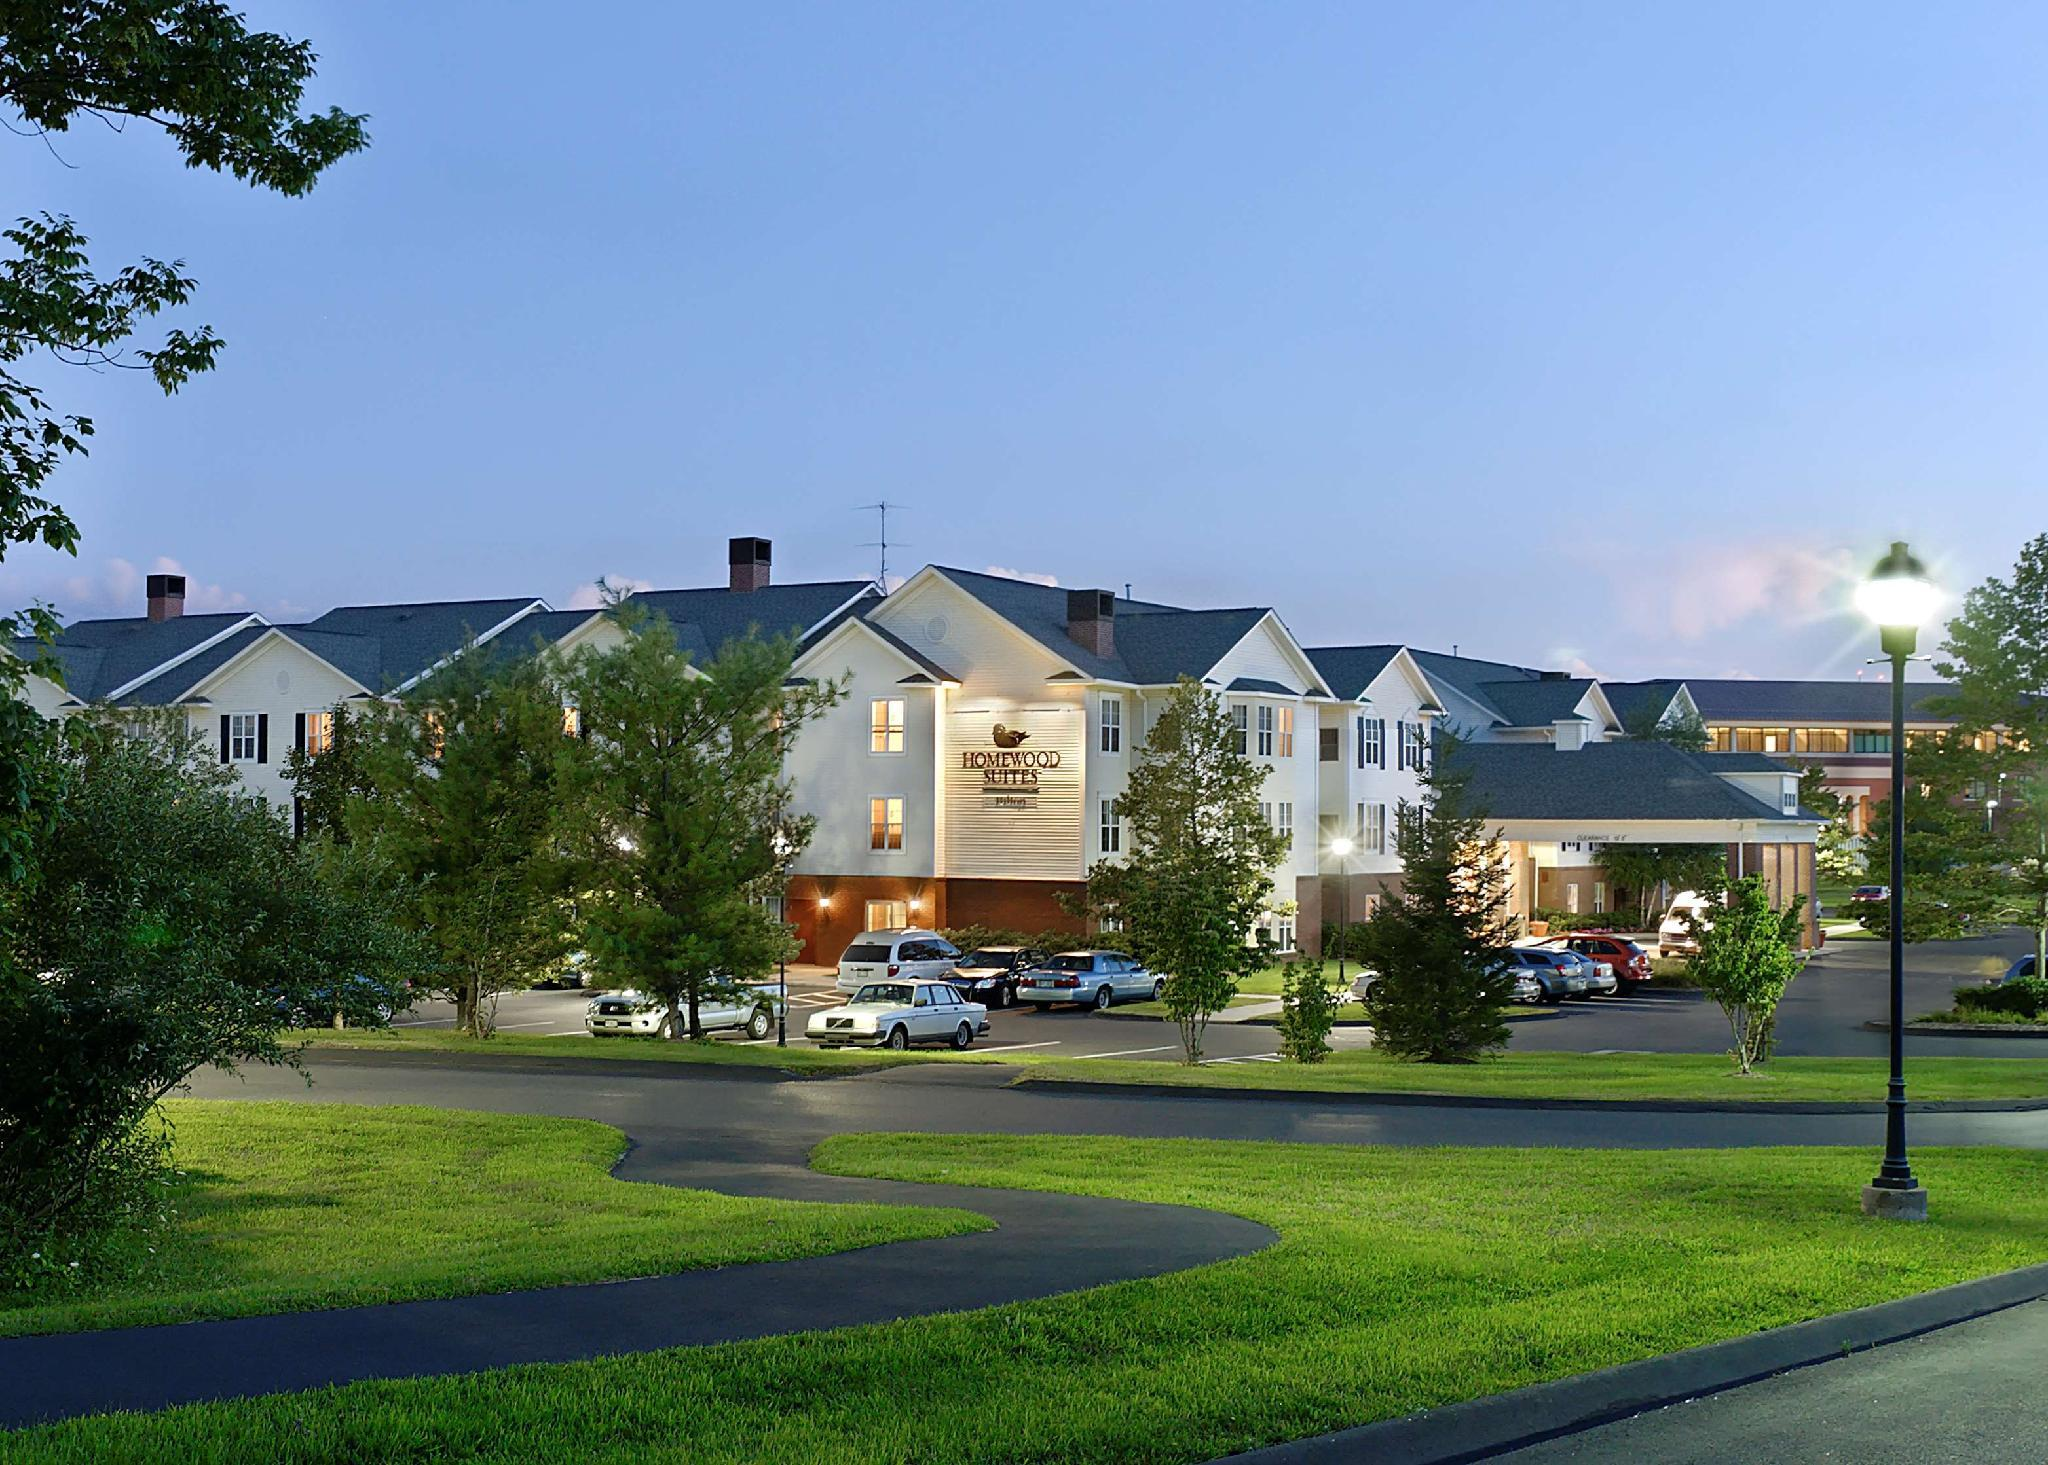 Homewood Suites By Hilton Hartford Farmington